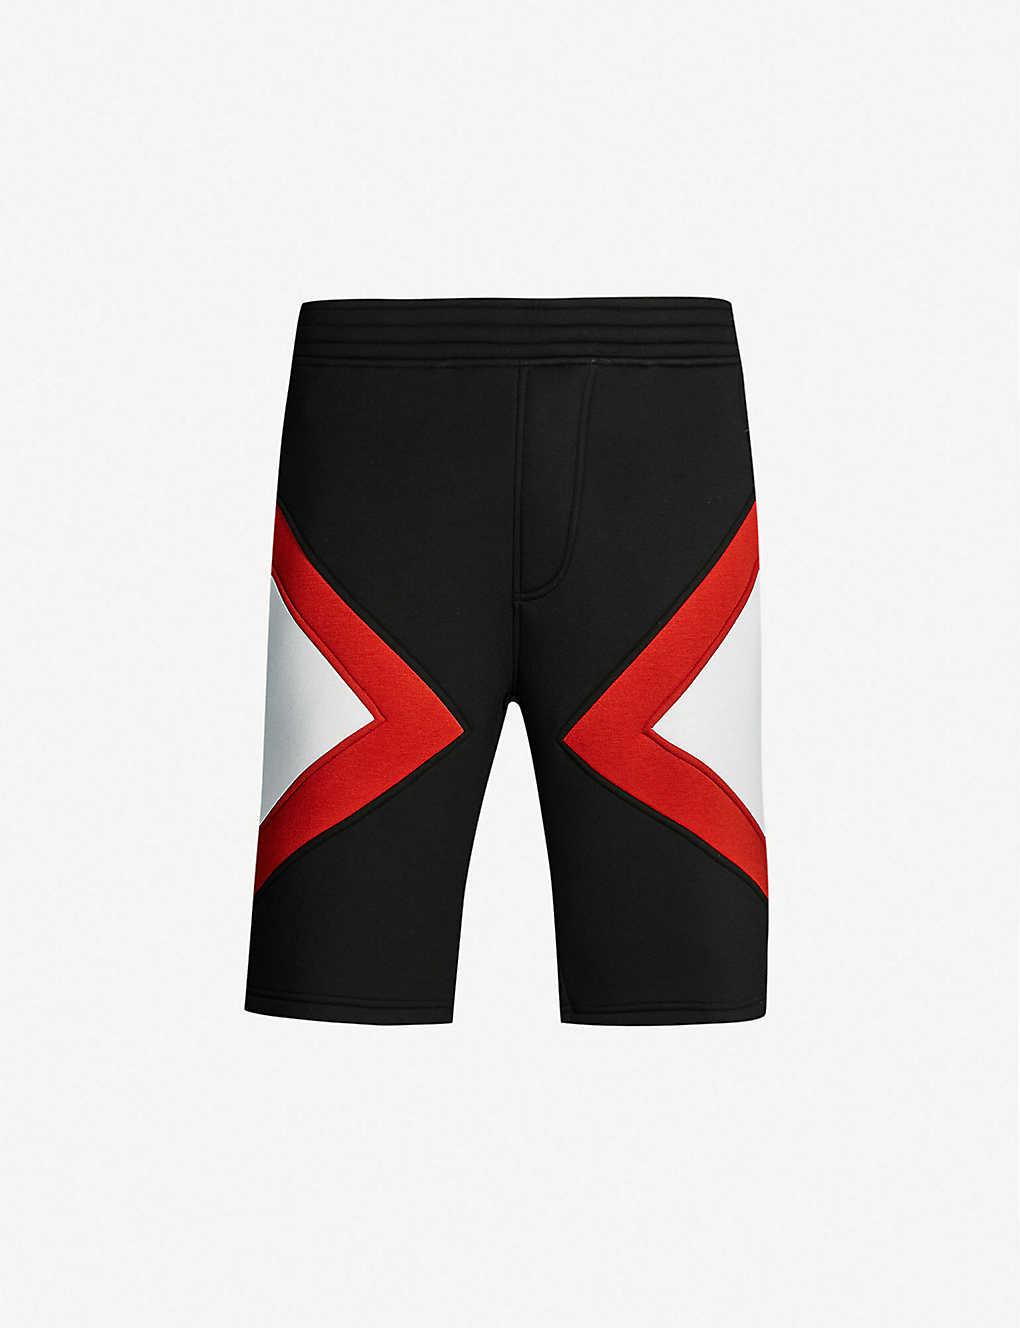 cd9fc699e3 Modernist printed jersey shorts